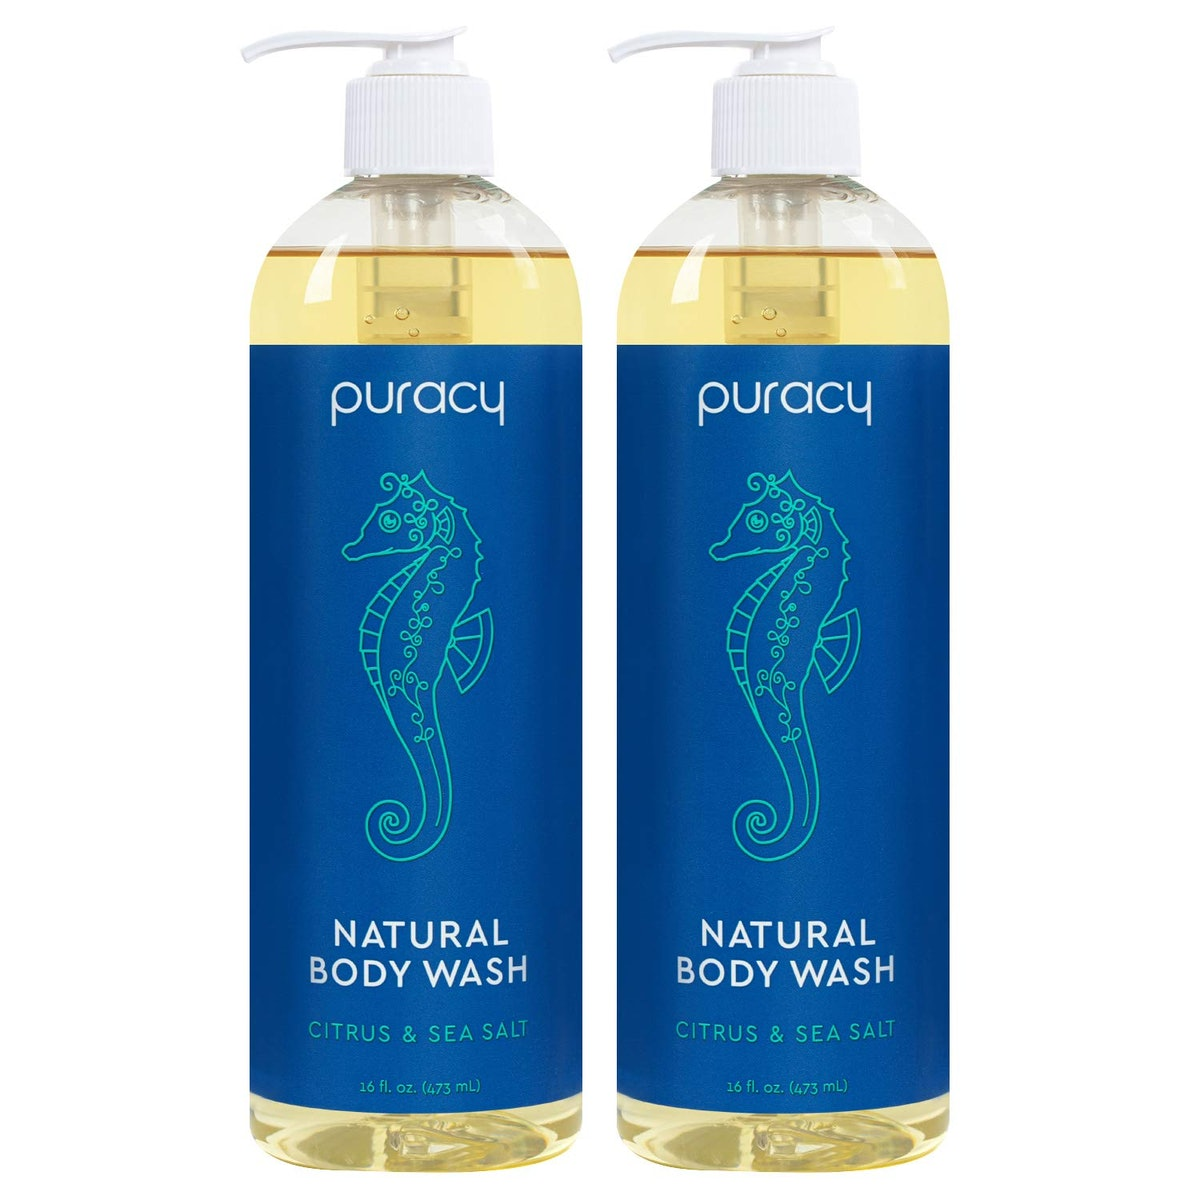 Puracy Body Wash (2-Pack)